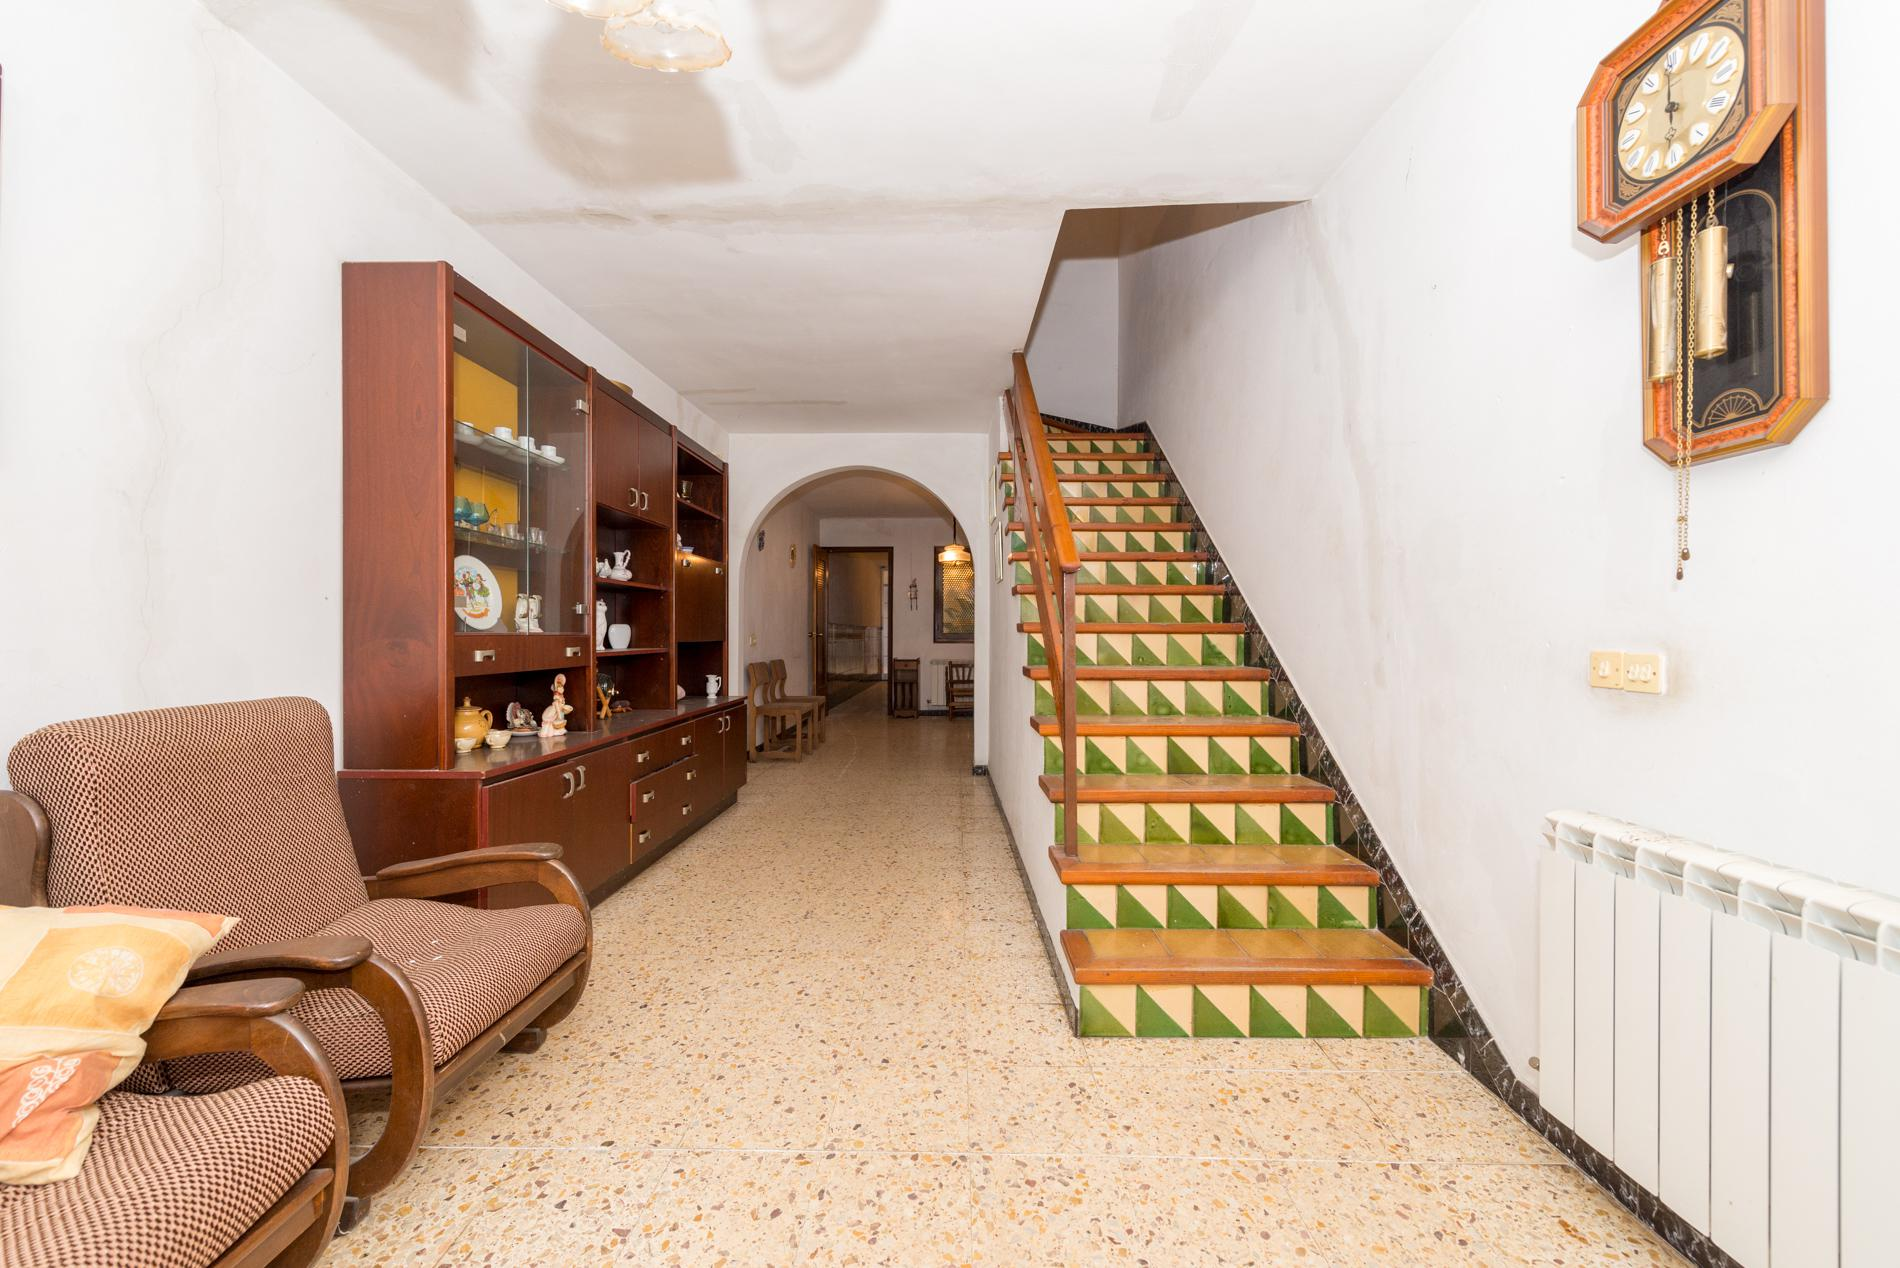 151209 - Casco antiguo de Piera